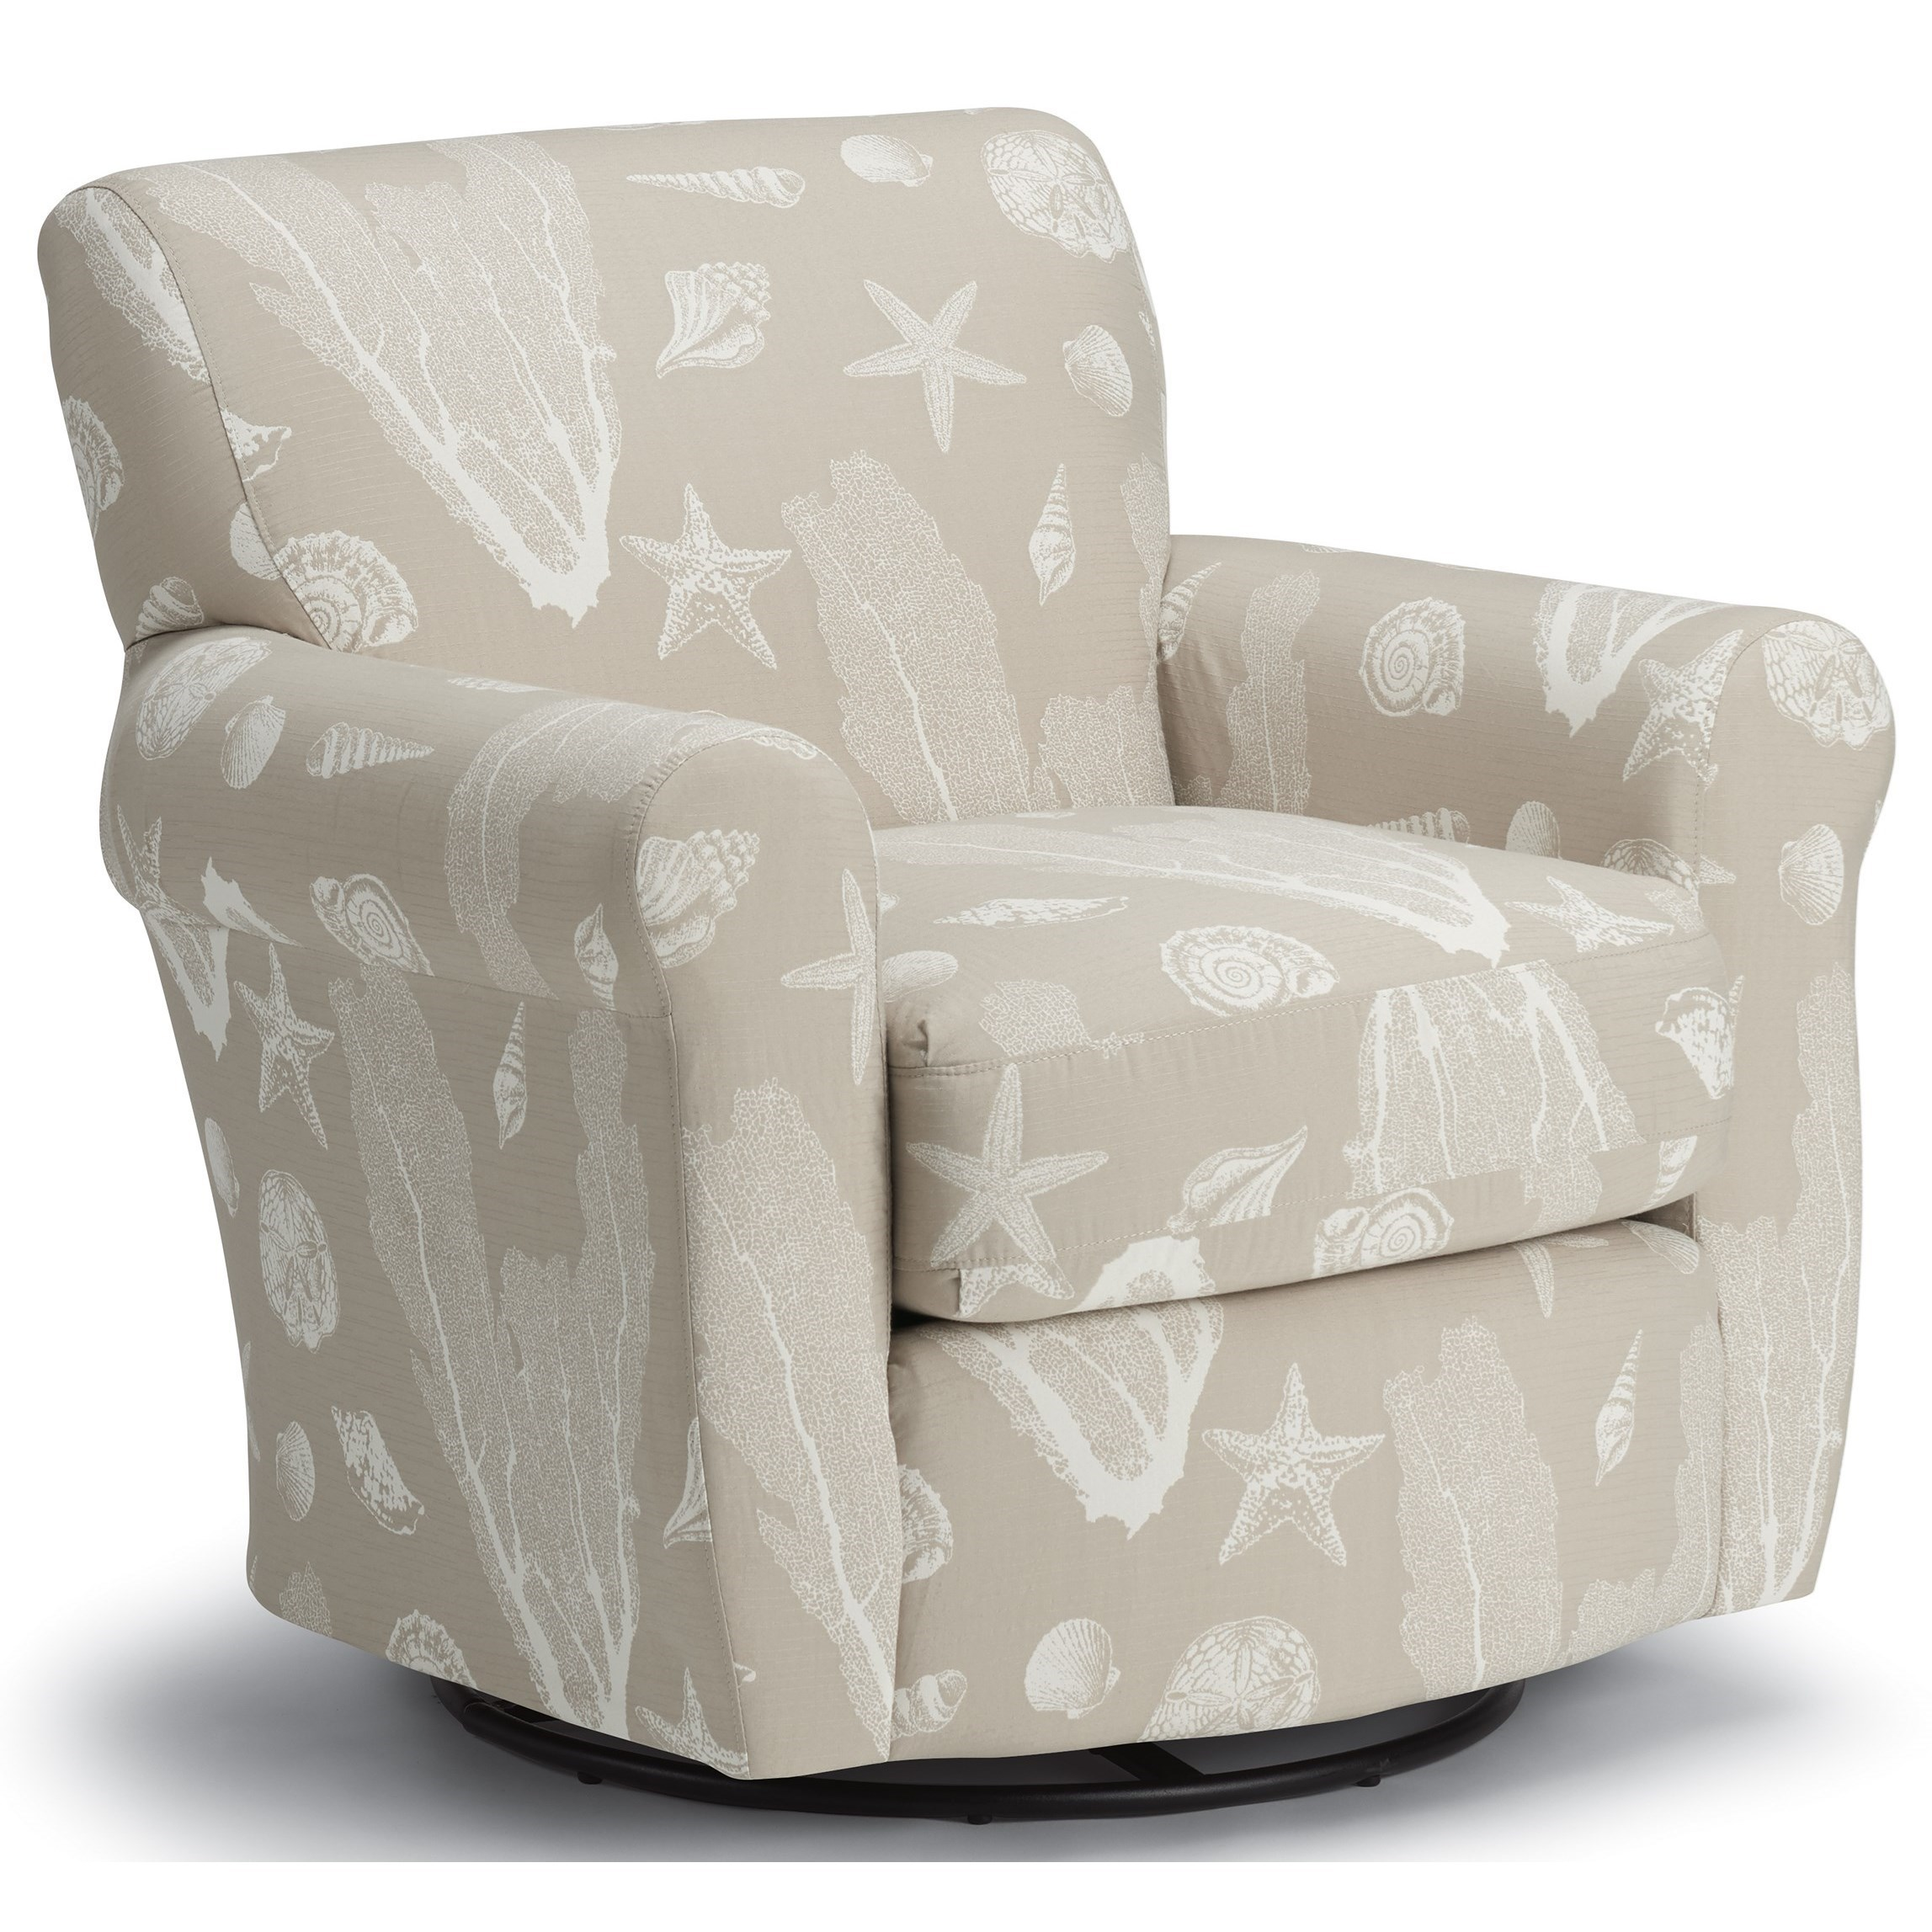 Transitional Swivel Glider Chair